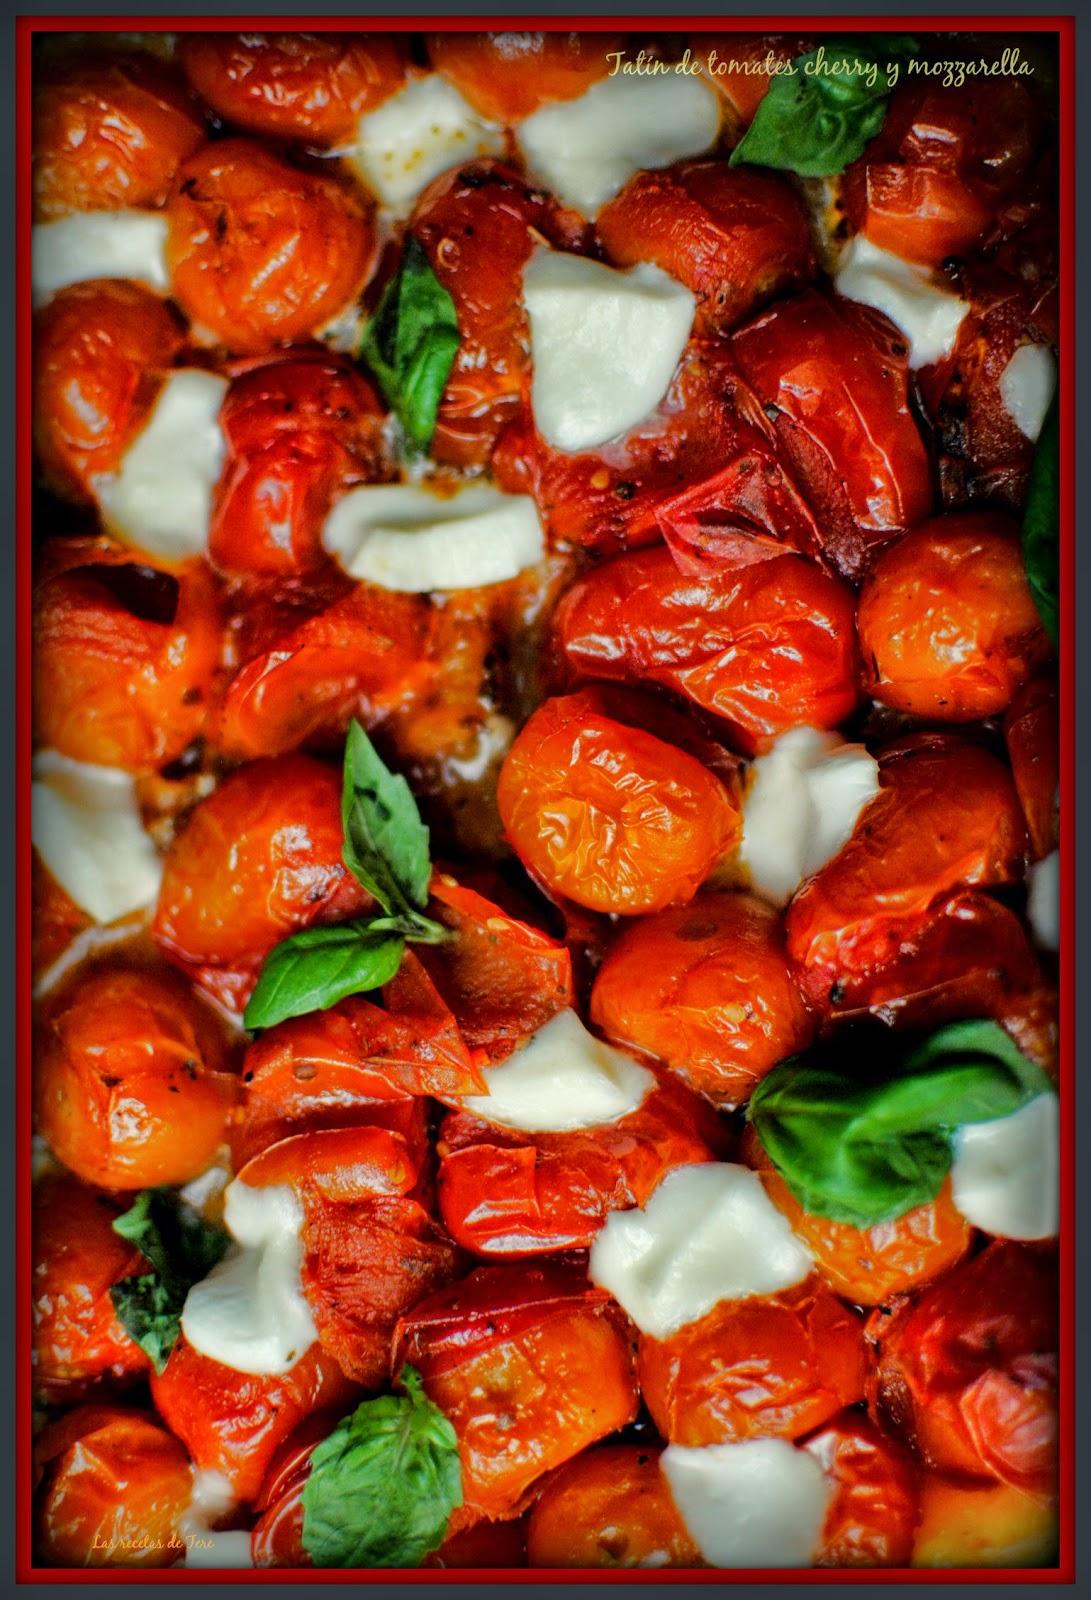 tatín de tomates cherry y mozzarella tererecetas 02